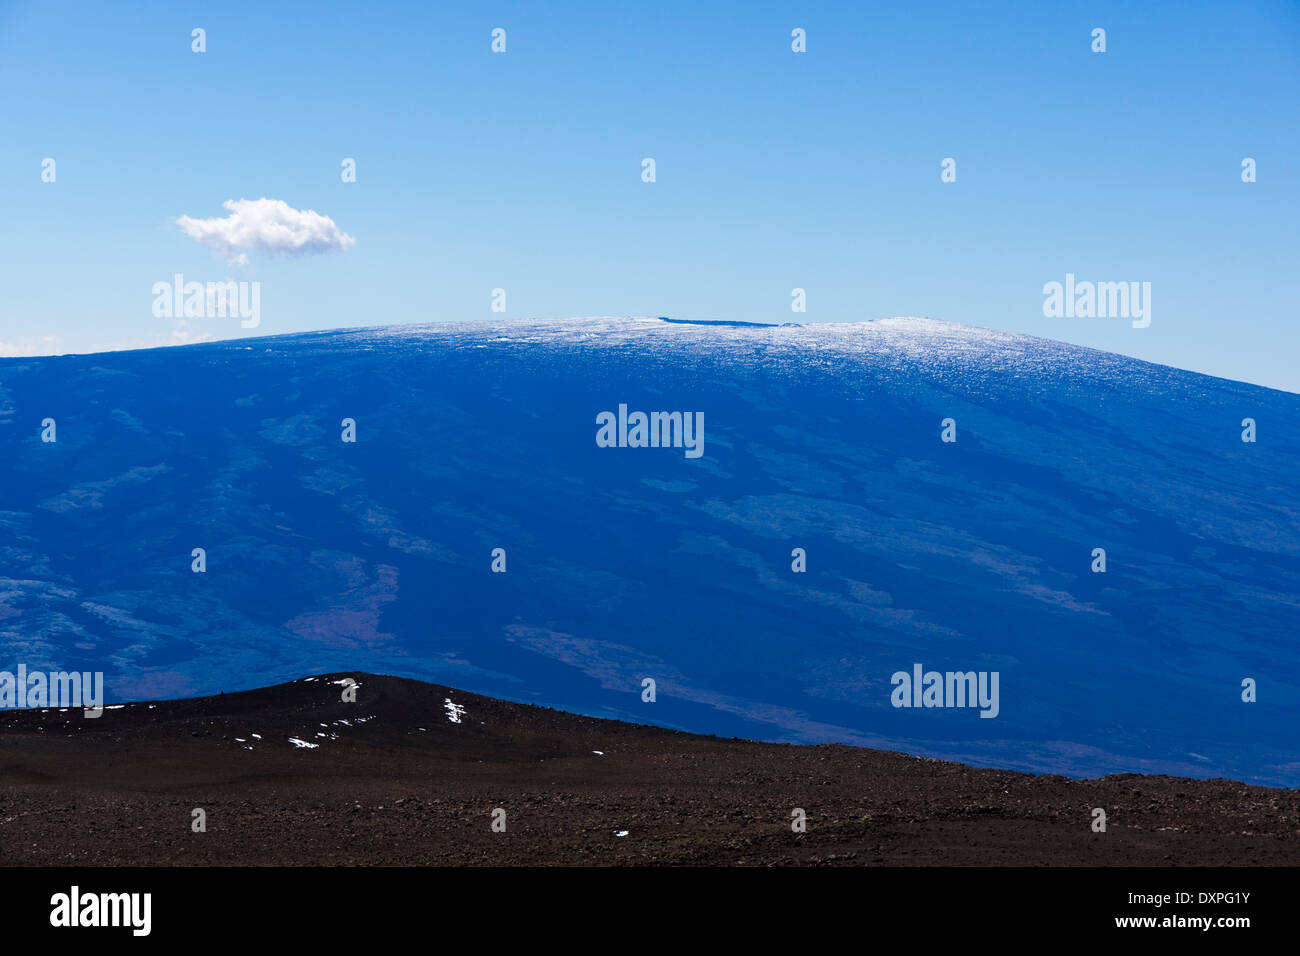 Volcán Mauna Loa, vistos desde la cumbre de Mauna Kea. Isla Grande de Hawaii. Foto de stock